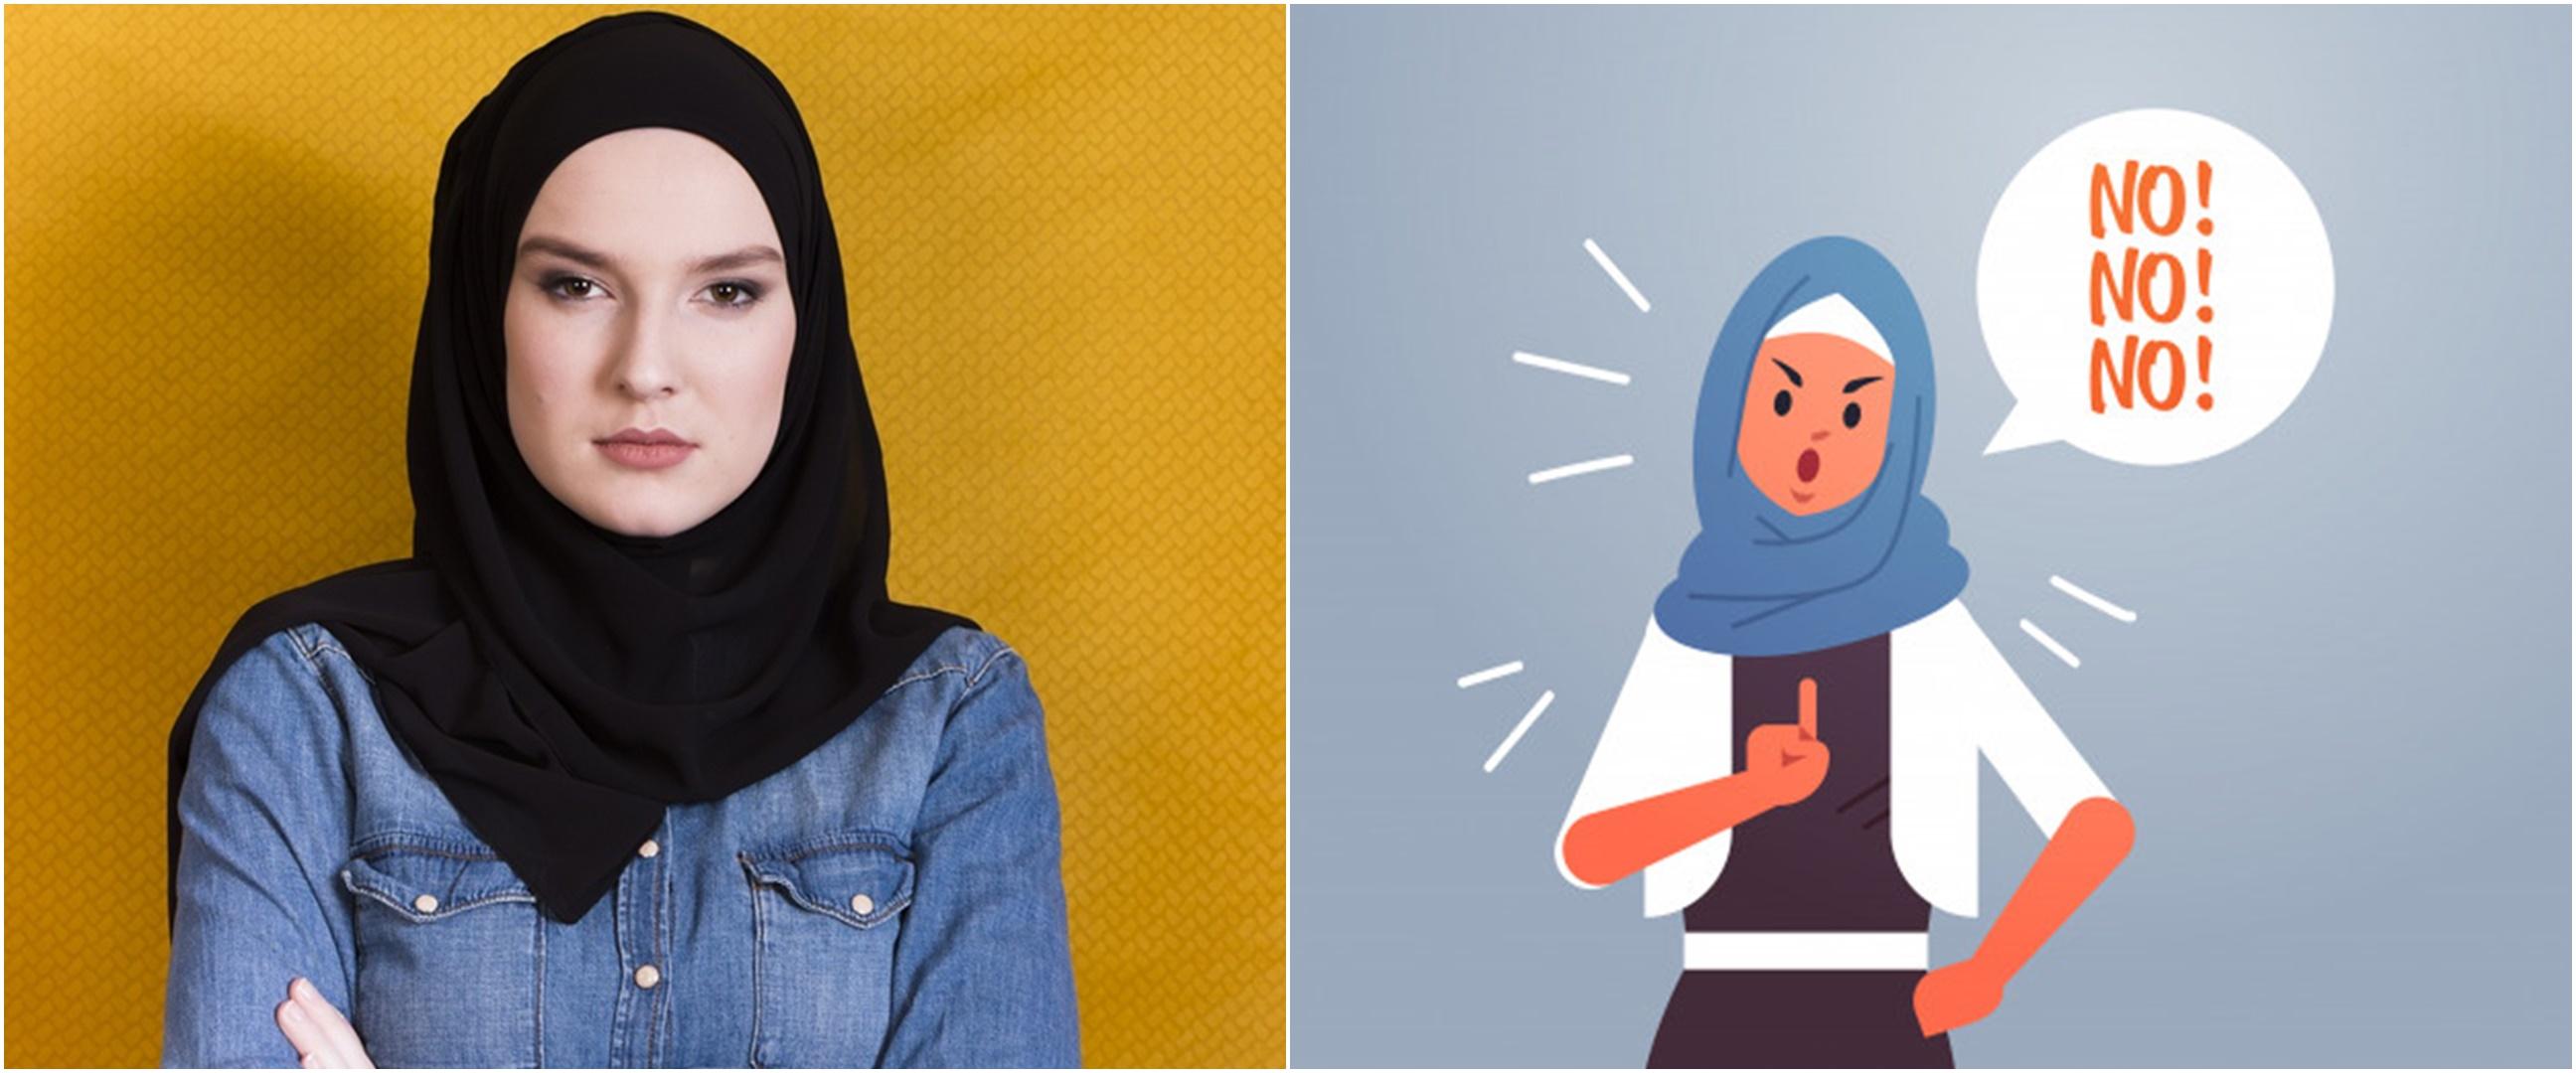 Hukum sifat iri dengki dan cara menghindarinya dalam Islam